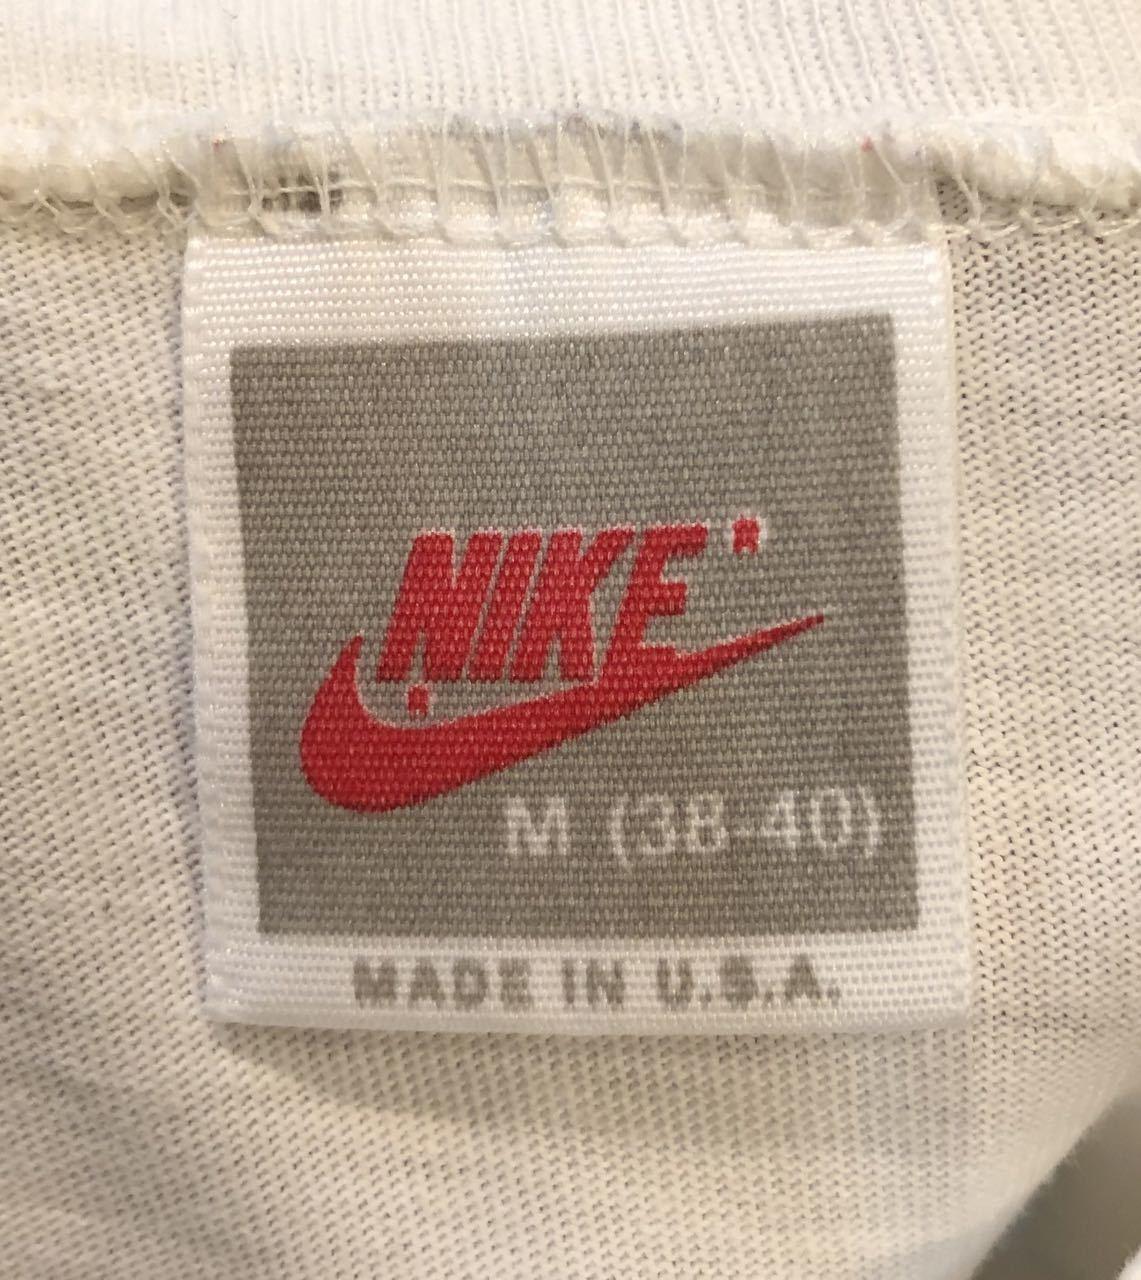 4月20日(土)入荷!MADE IN U.S.A 80s NIKE  PENN STATE foot ball Tシャツ!_c0144020_14444691.jpg